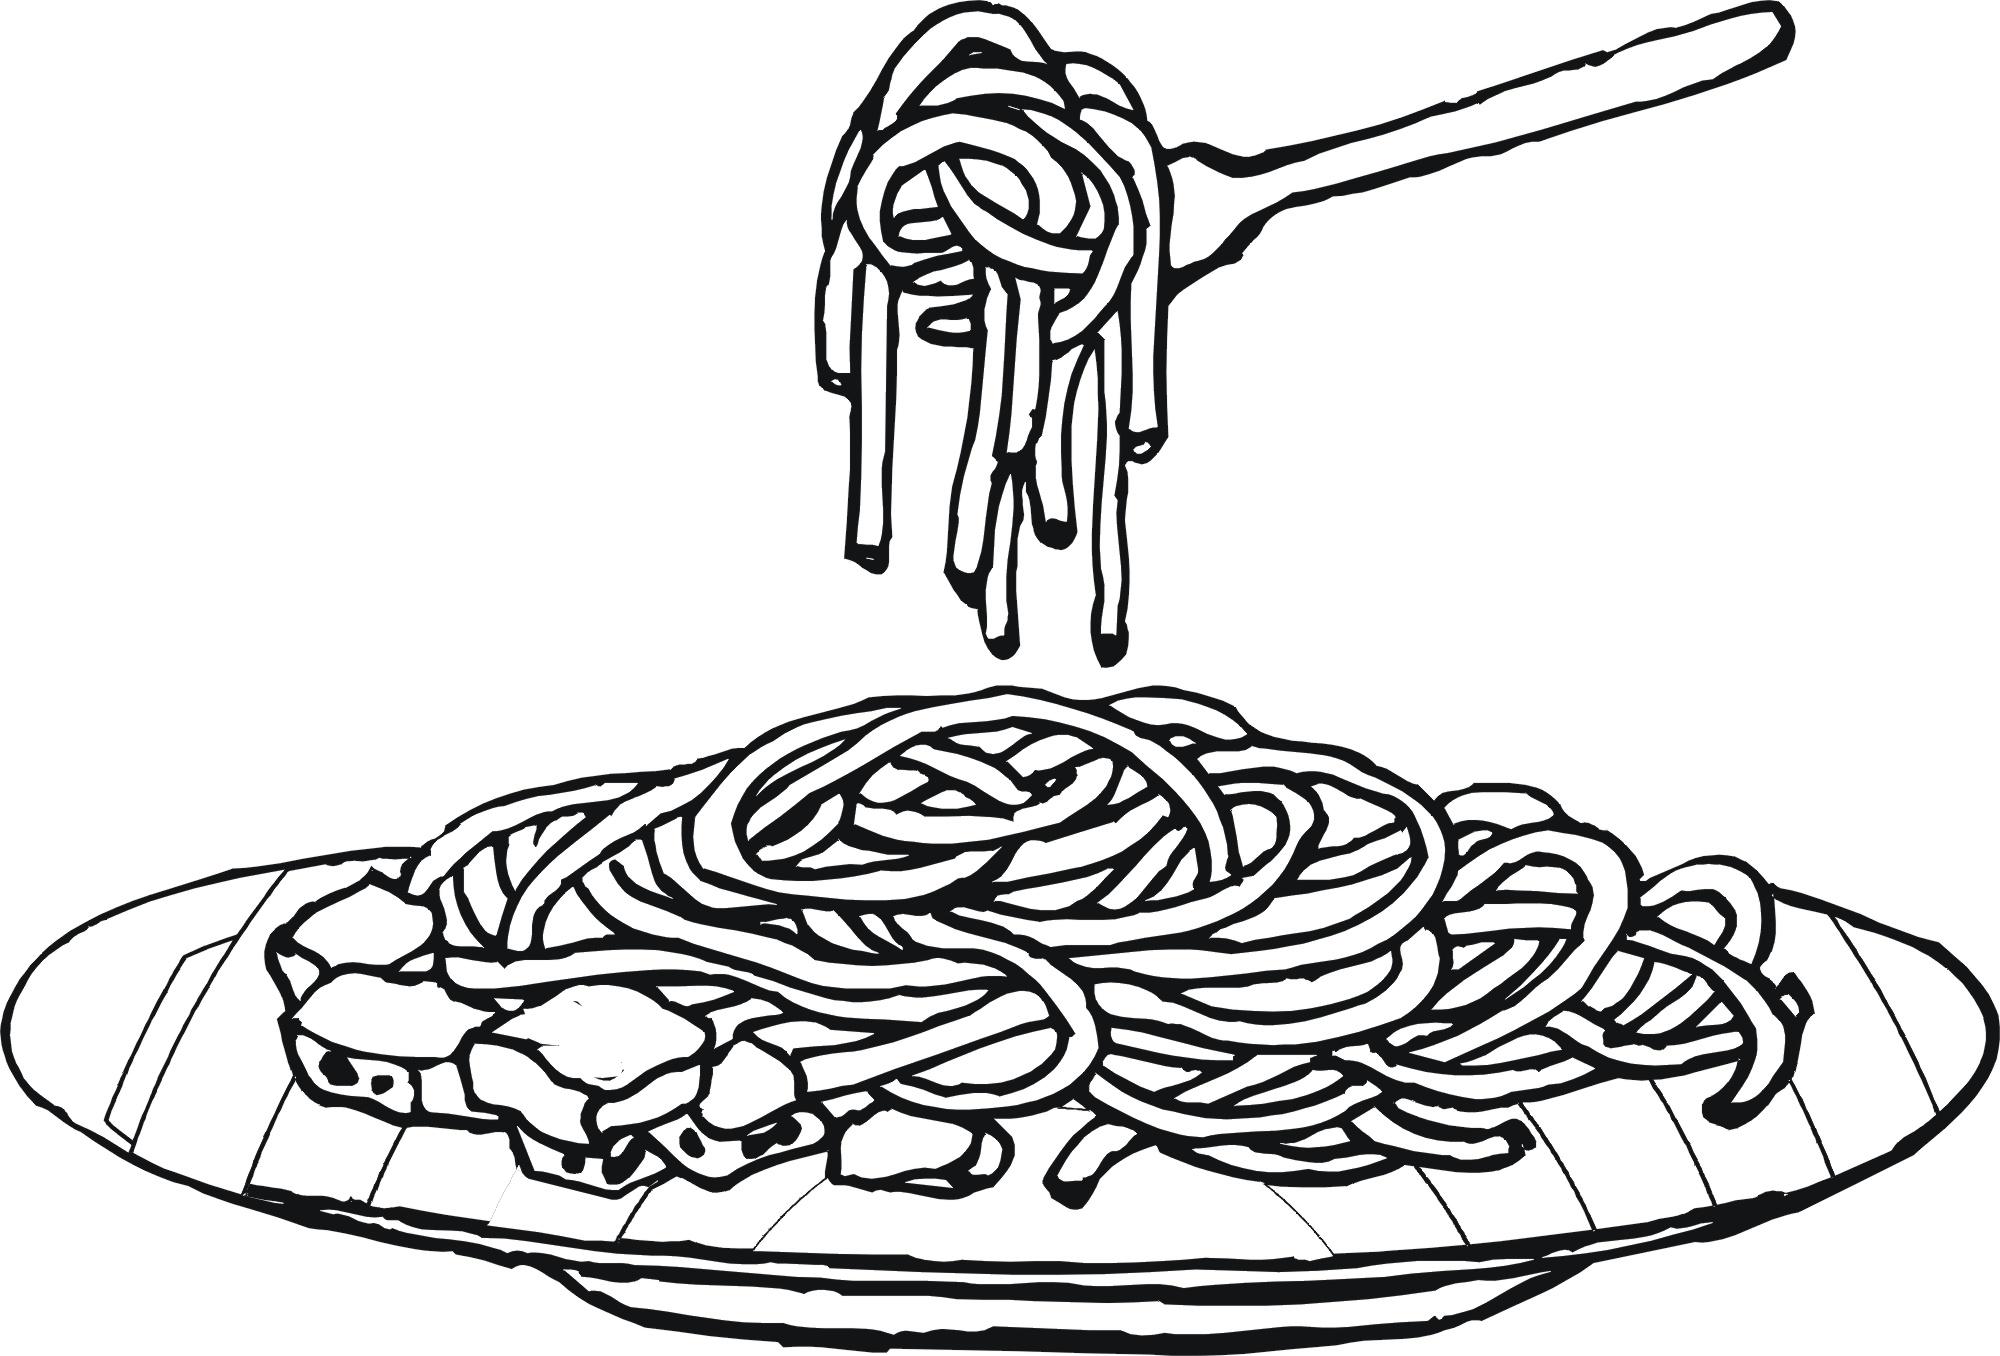 Download High Quality pasta clipart black Transparent PNG.